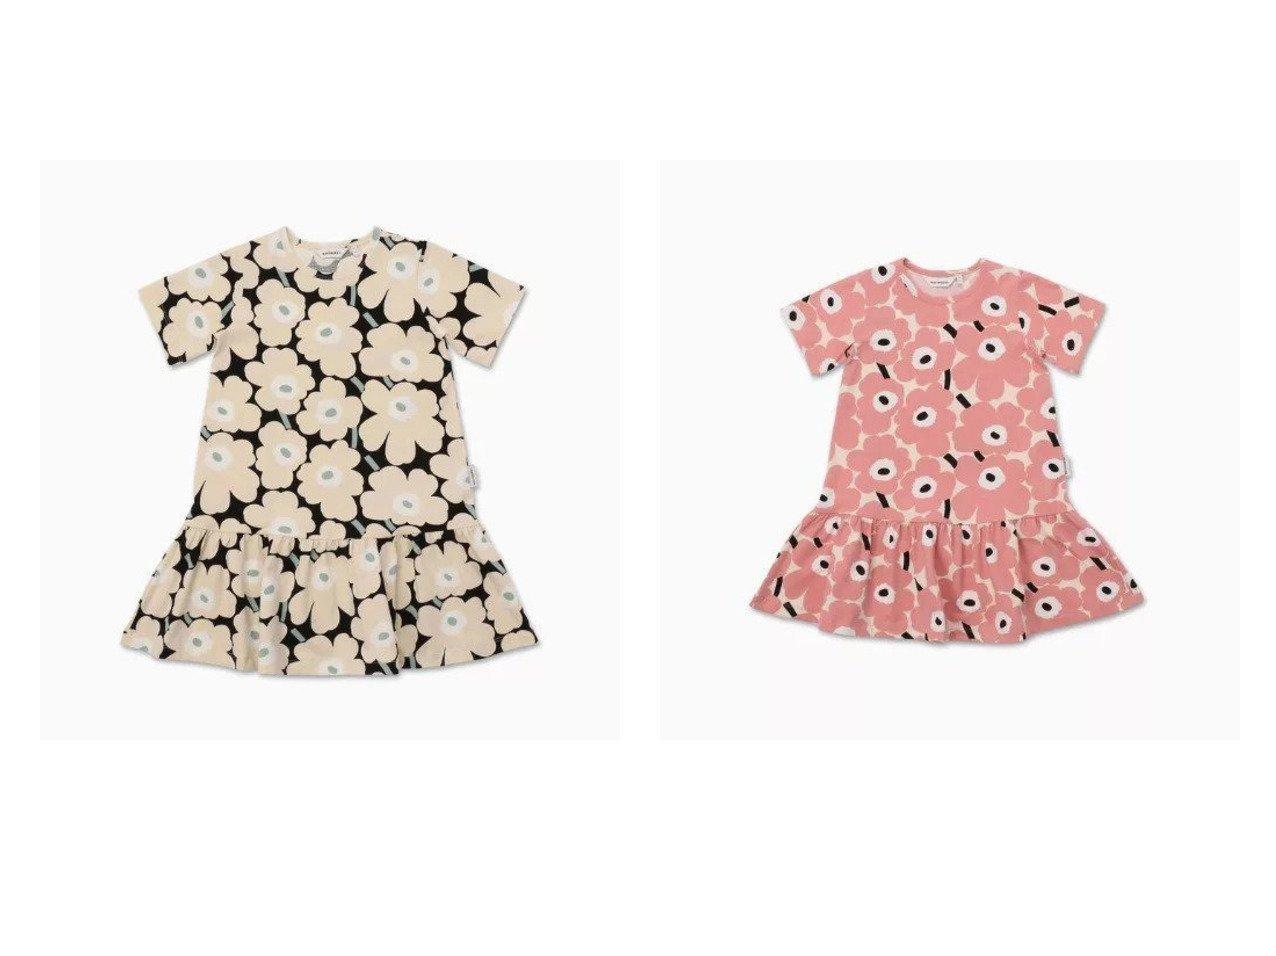 【marimekko / KIDS/マリメッコ】の[Kids]Ihailla Mini Unikot 2 ワンピース&[Kids]Ihailla Mini Unikot 1 ワンピース 【KIDS】子供服のおすすめ!人気トレンド・キッズファッションの通販  おすすめで人気の流行・トレンド、ファッションの通販商品 メンズファッション・キッズファッション・インテリア・家具・レディースファッション・服の通販 founy(ファニー) https://founy.com/ ファッション Fashion キッズファッション KIDS ワンピース Dress/Kids ジャージー ストレッチ フレア レギンス  ID:crp329100000027198